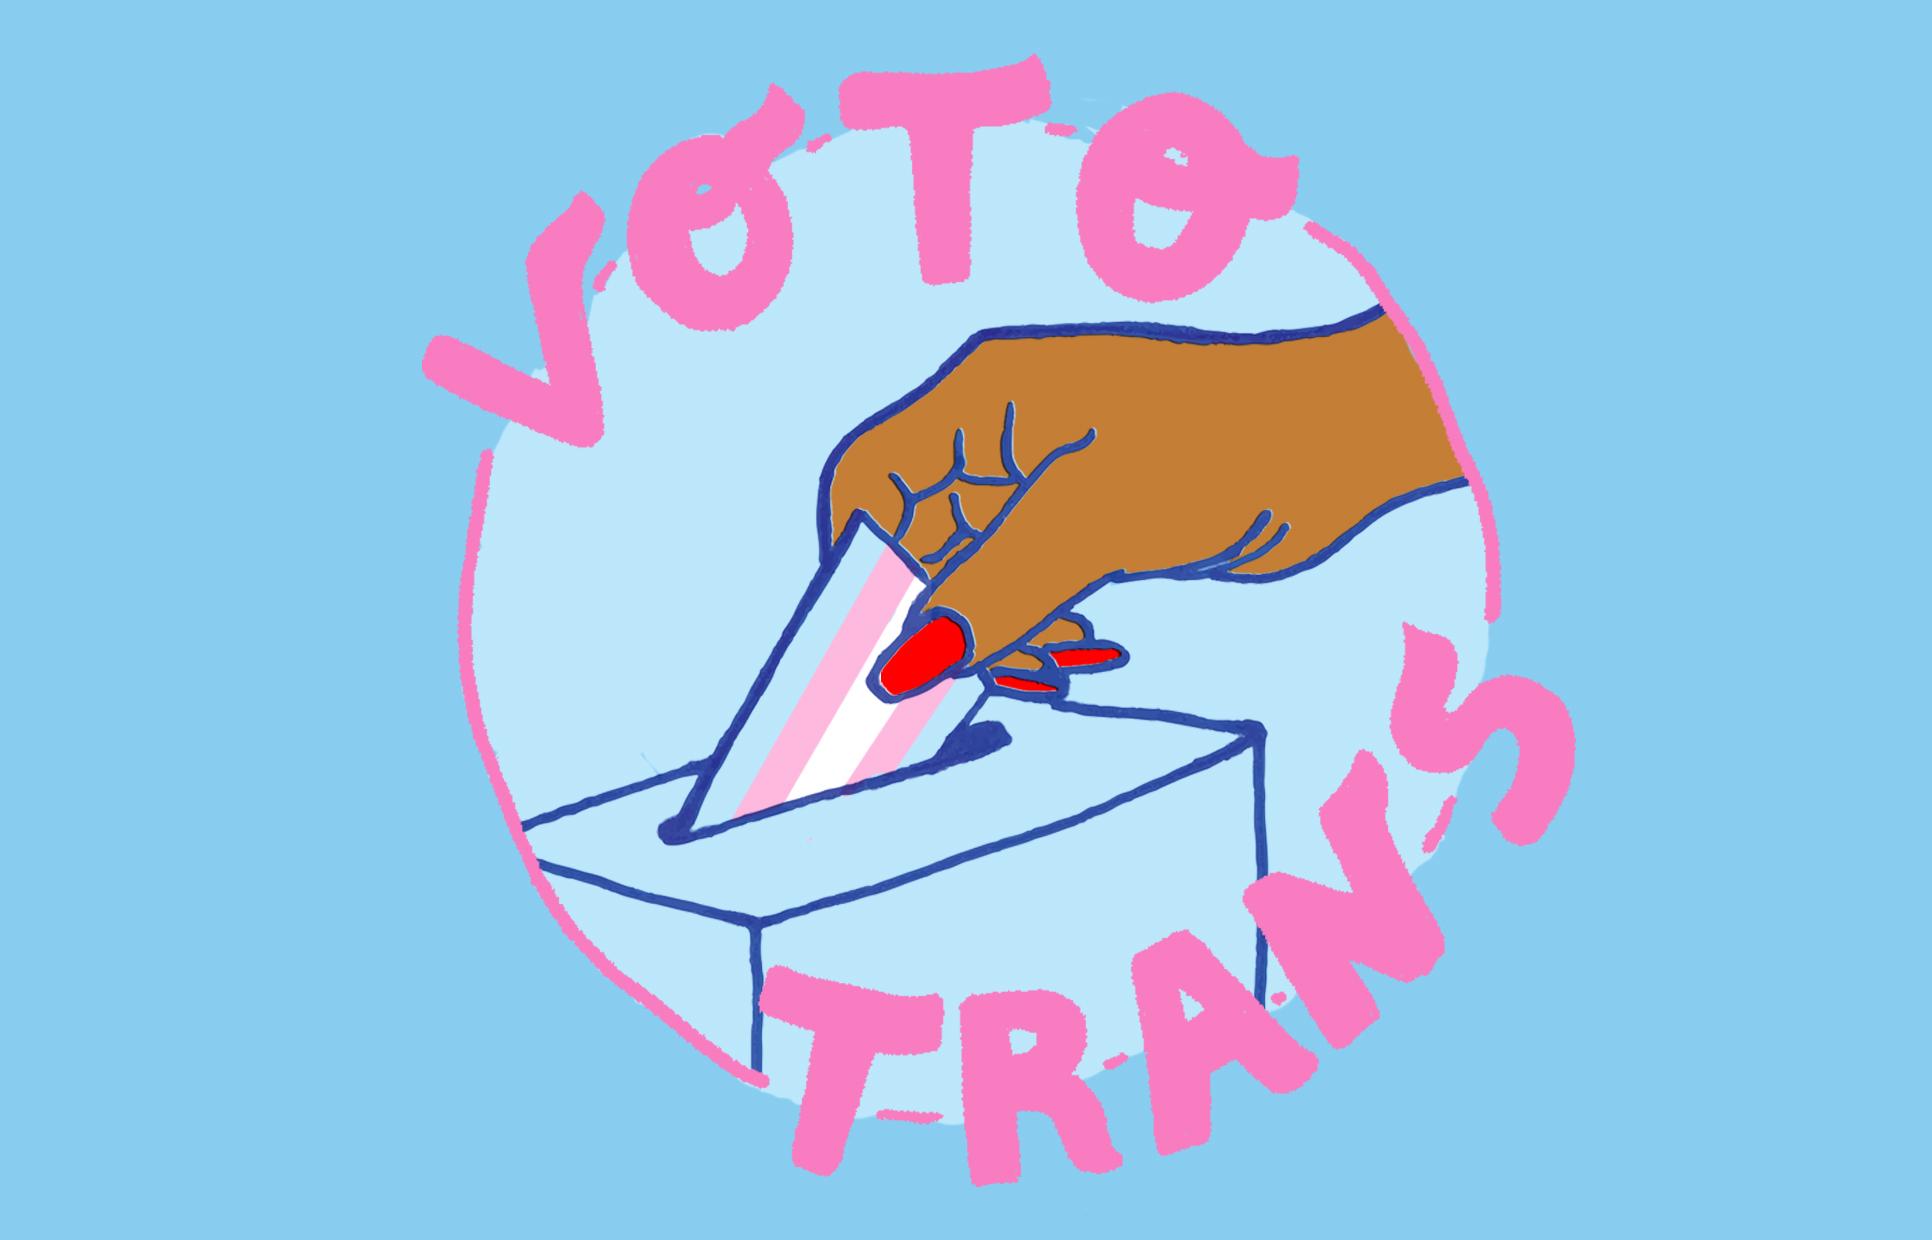 vototransbotón